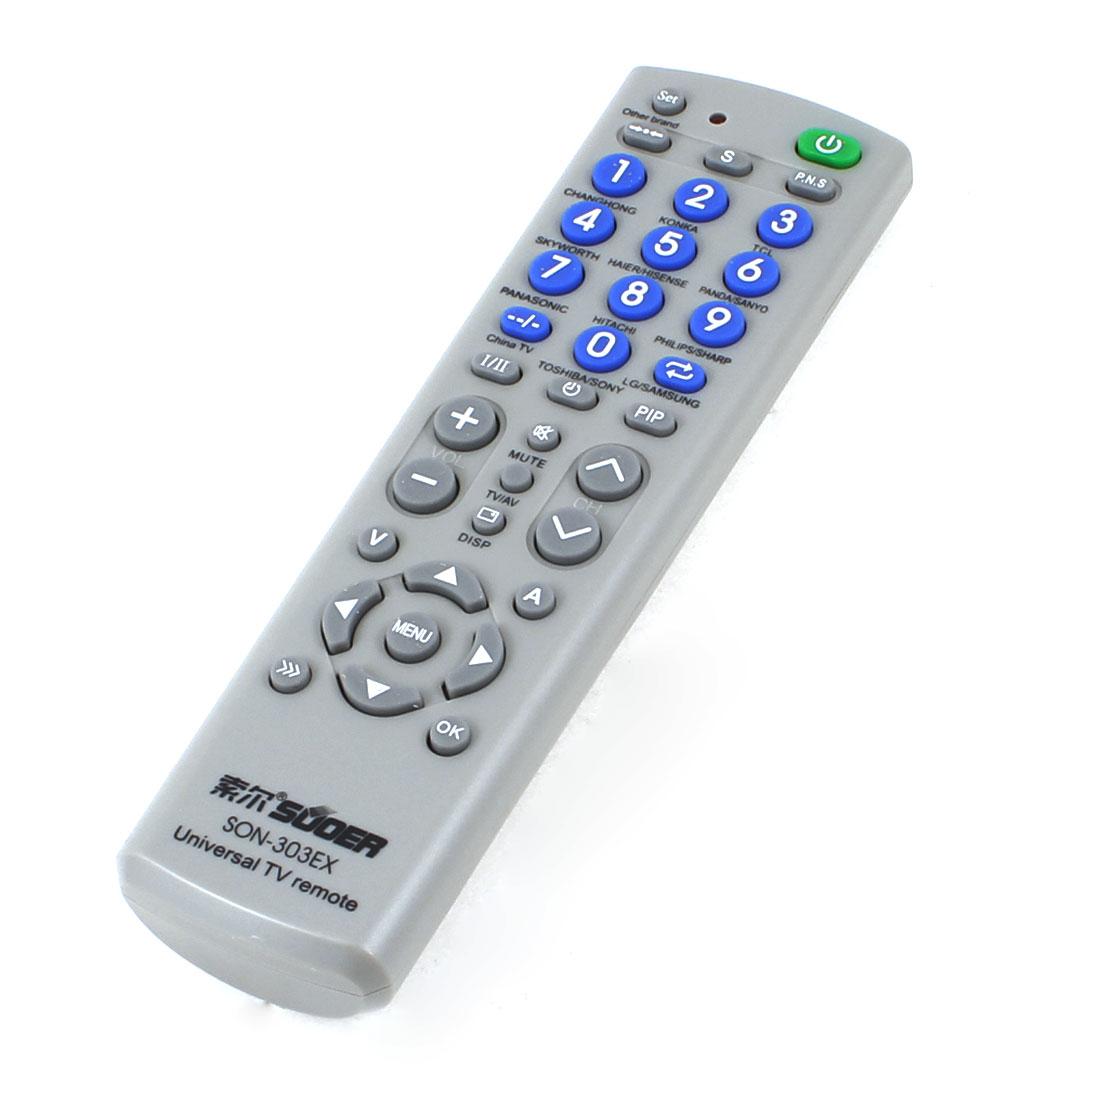 SON-303EX Multi-fuction TV Remote Controller Spare Part